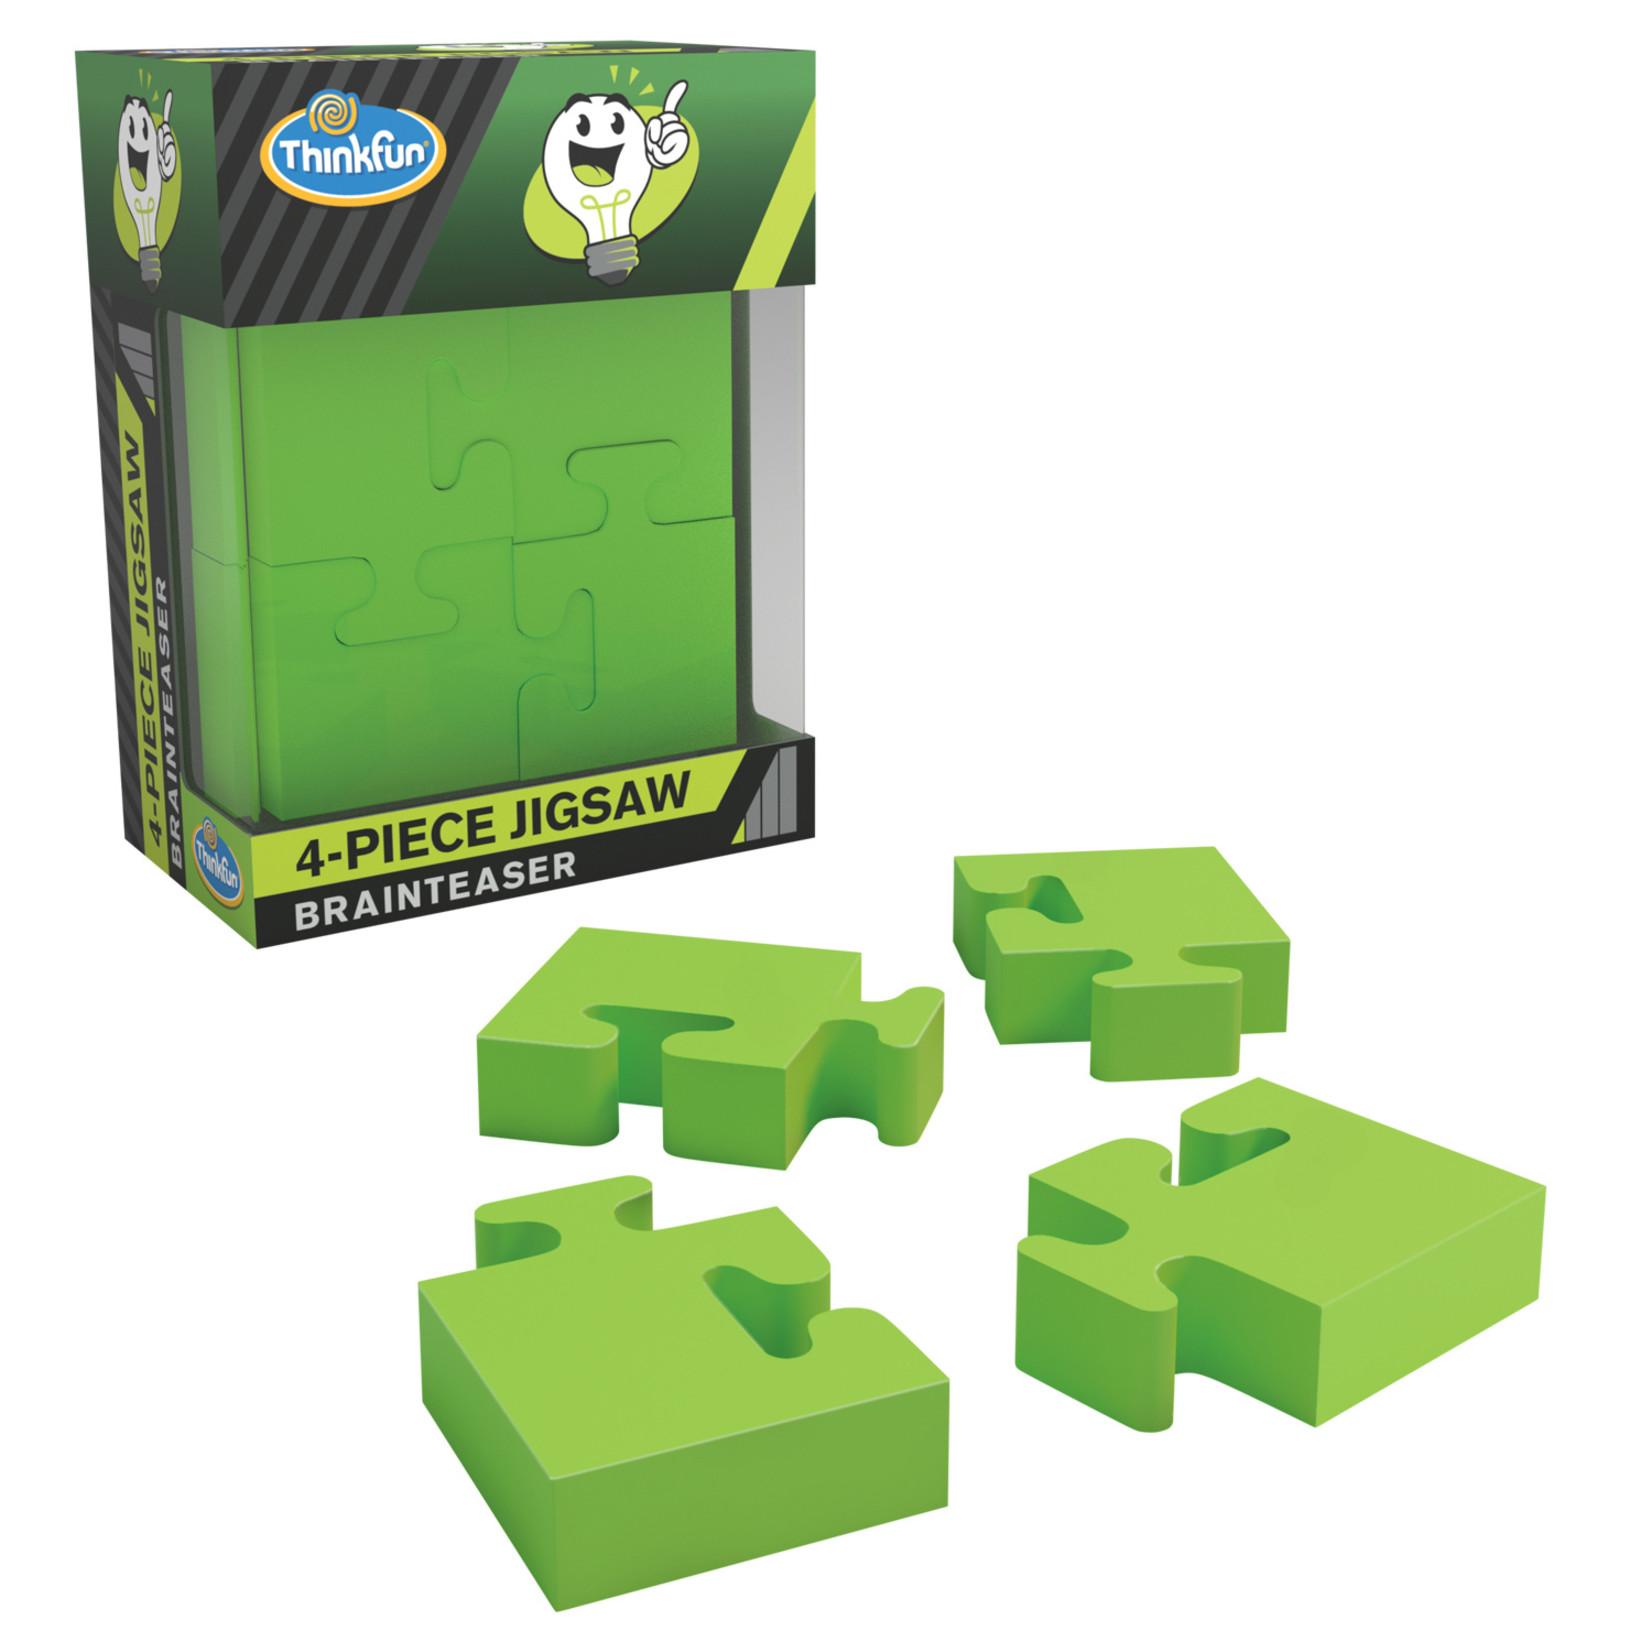 Thinkfun 4-Piece Jigsaw